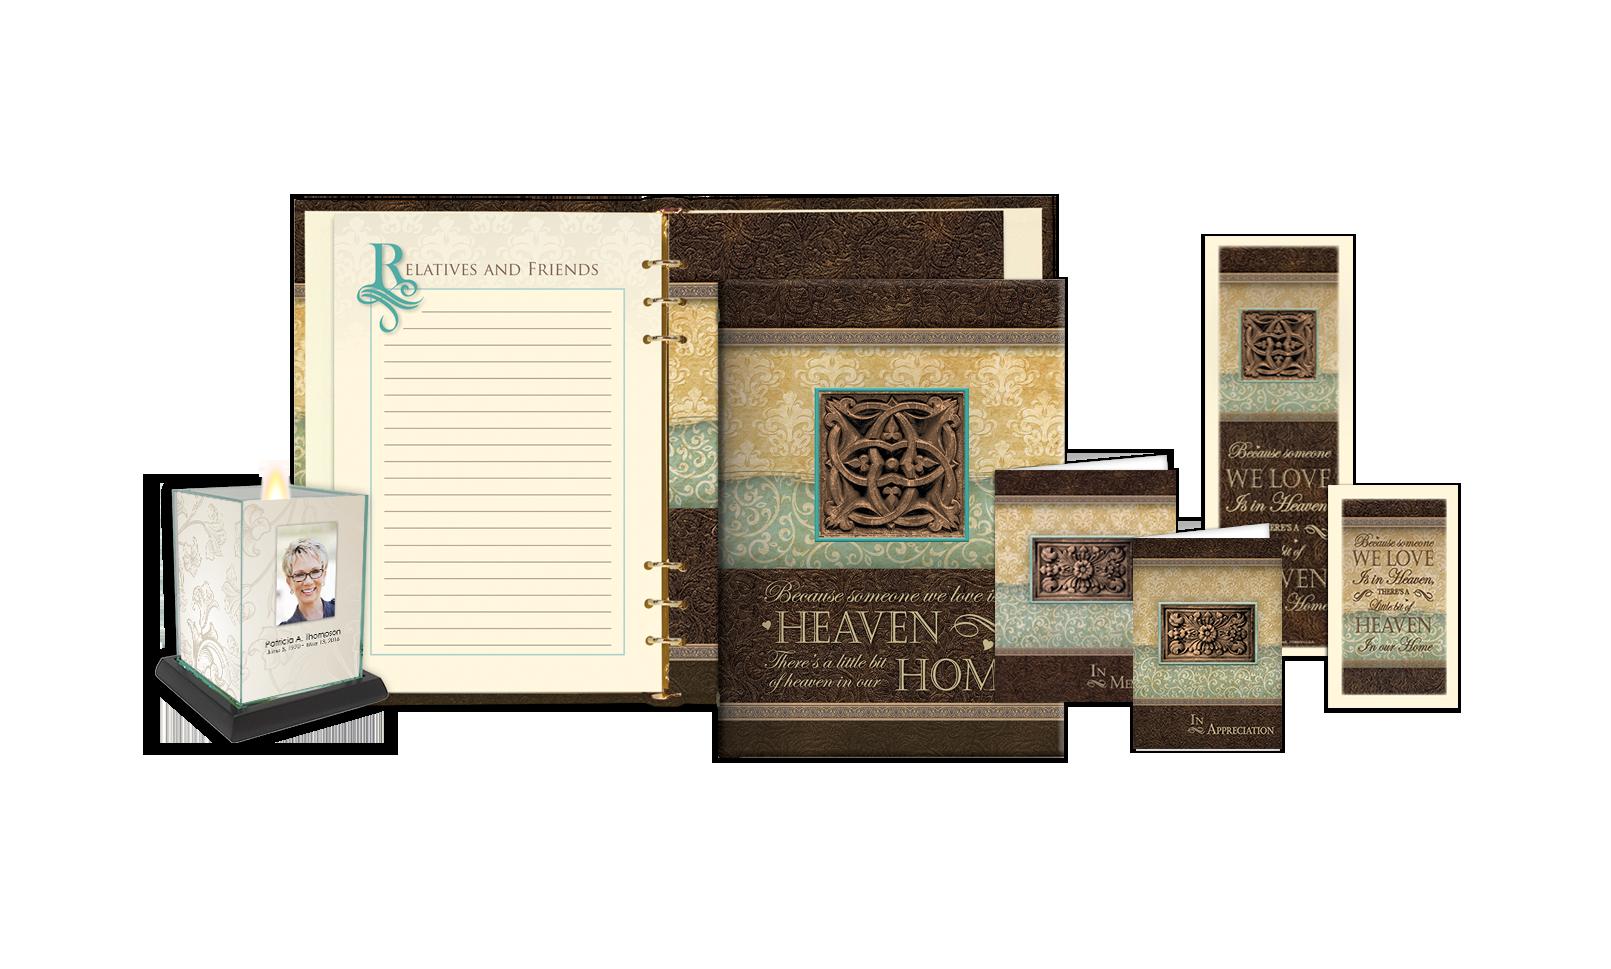 Heaven Series